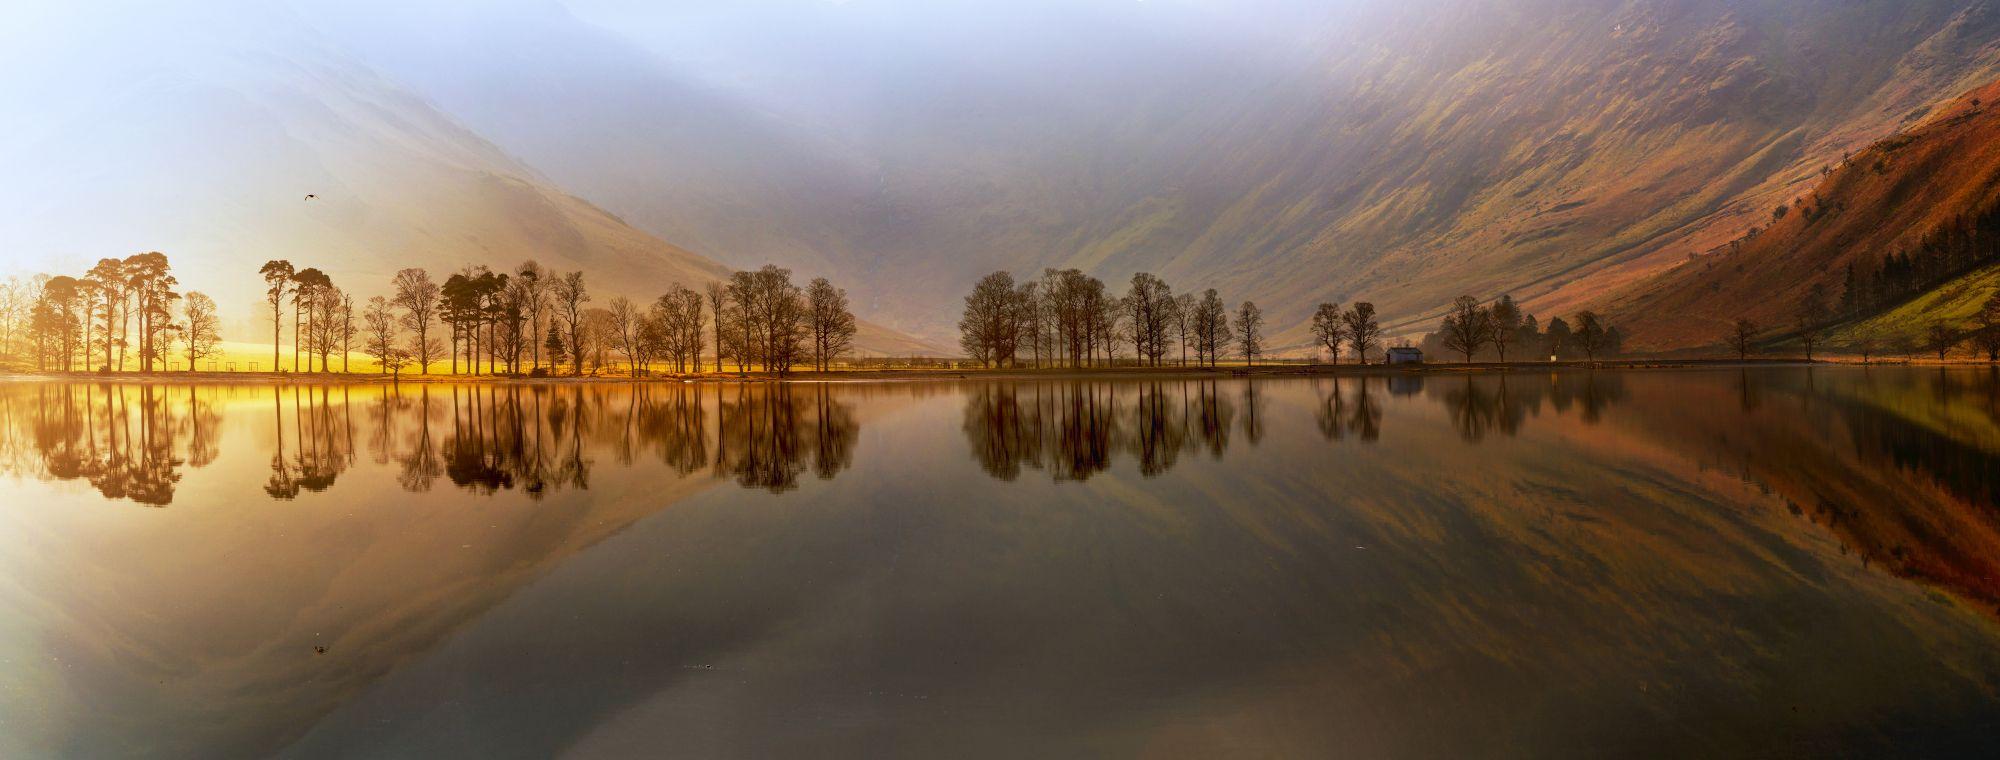 Landscape Photography Snowdonia Wales Lake District Landscape Uk Landscape Photography Landscape Photography Art Landscape